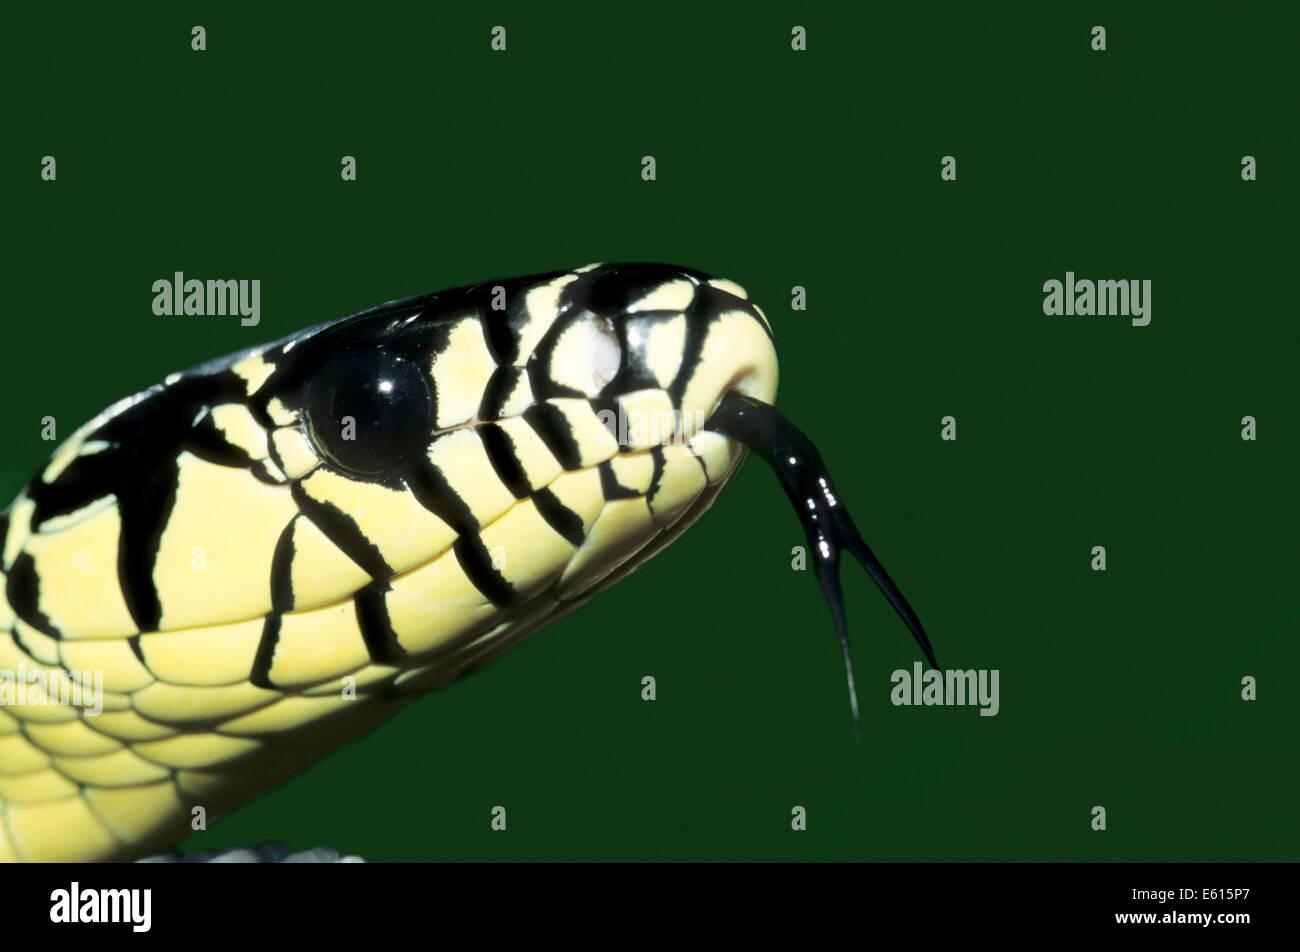 Caninana (Spilotes pullatus), lambent, native to South America, captive, Germany - Stock Image